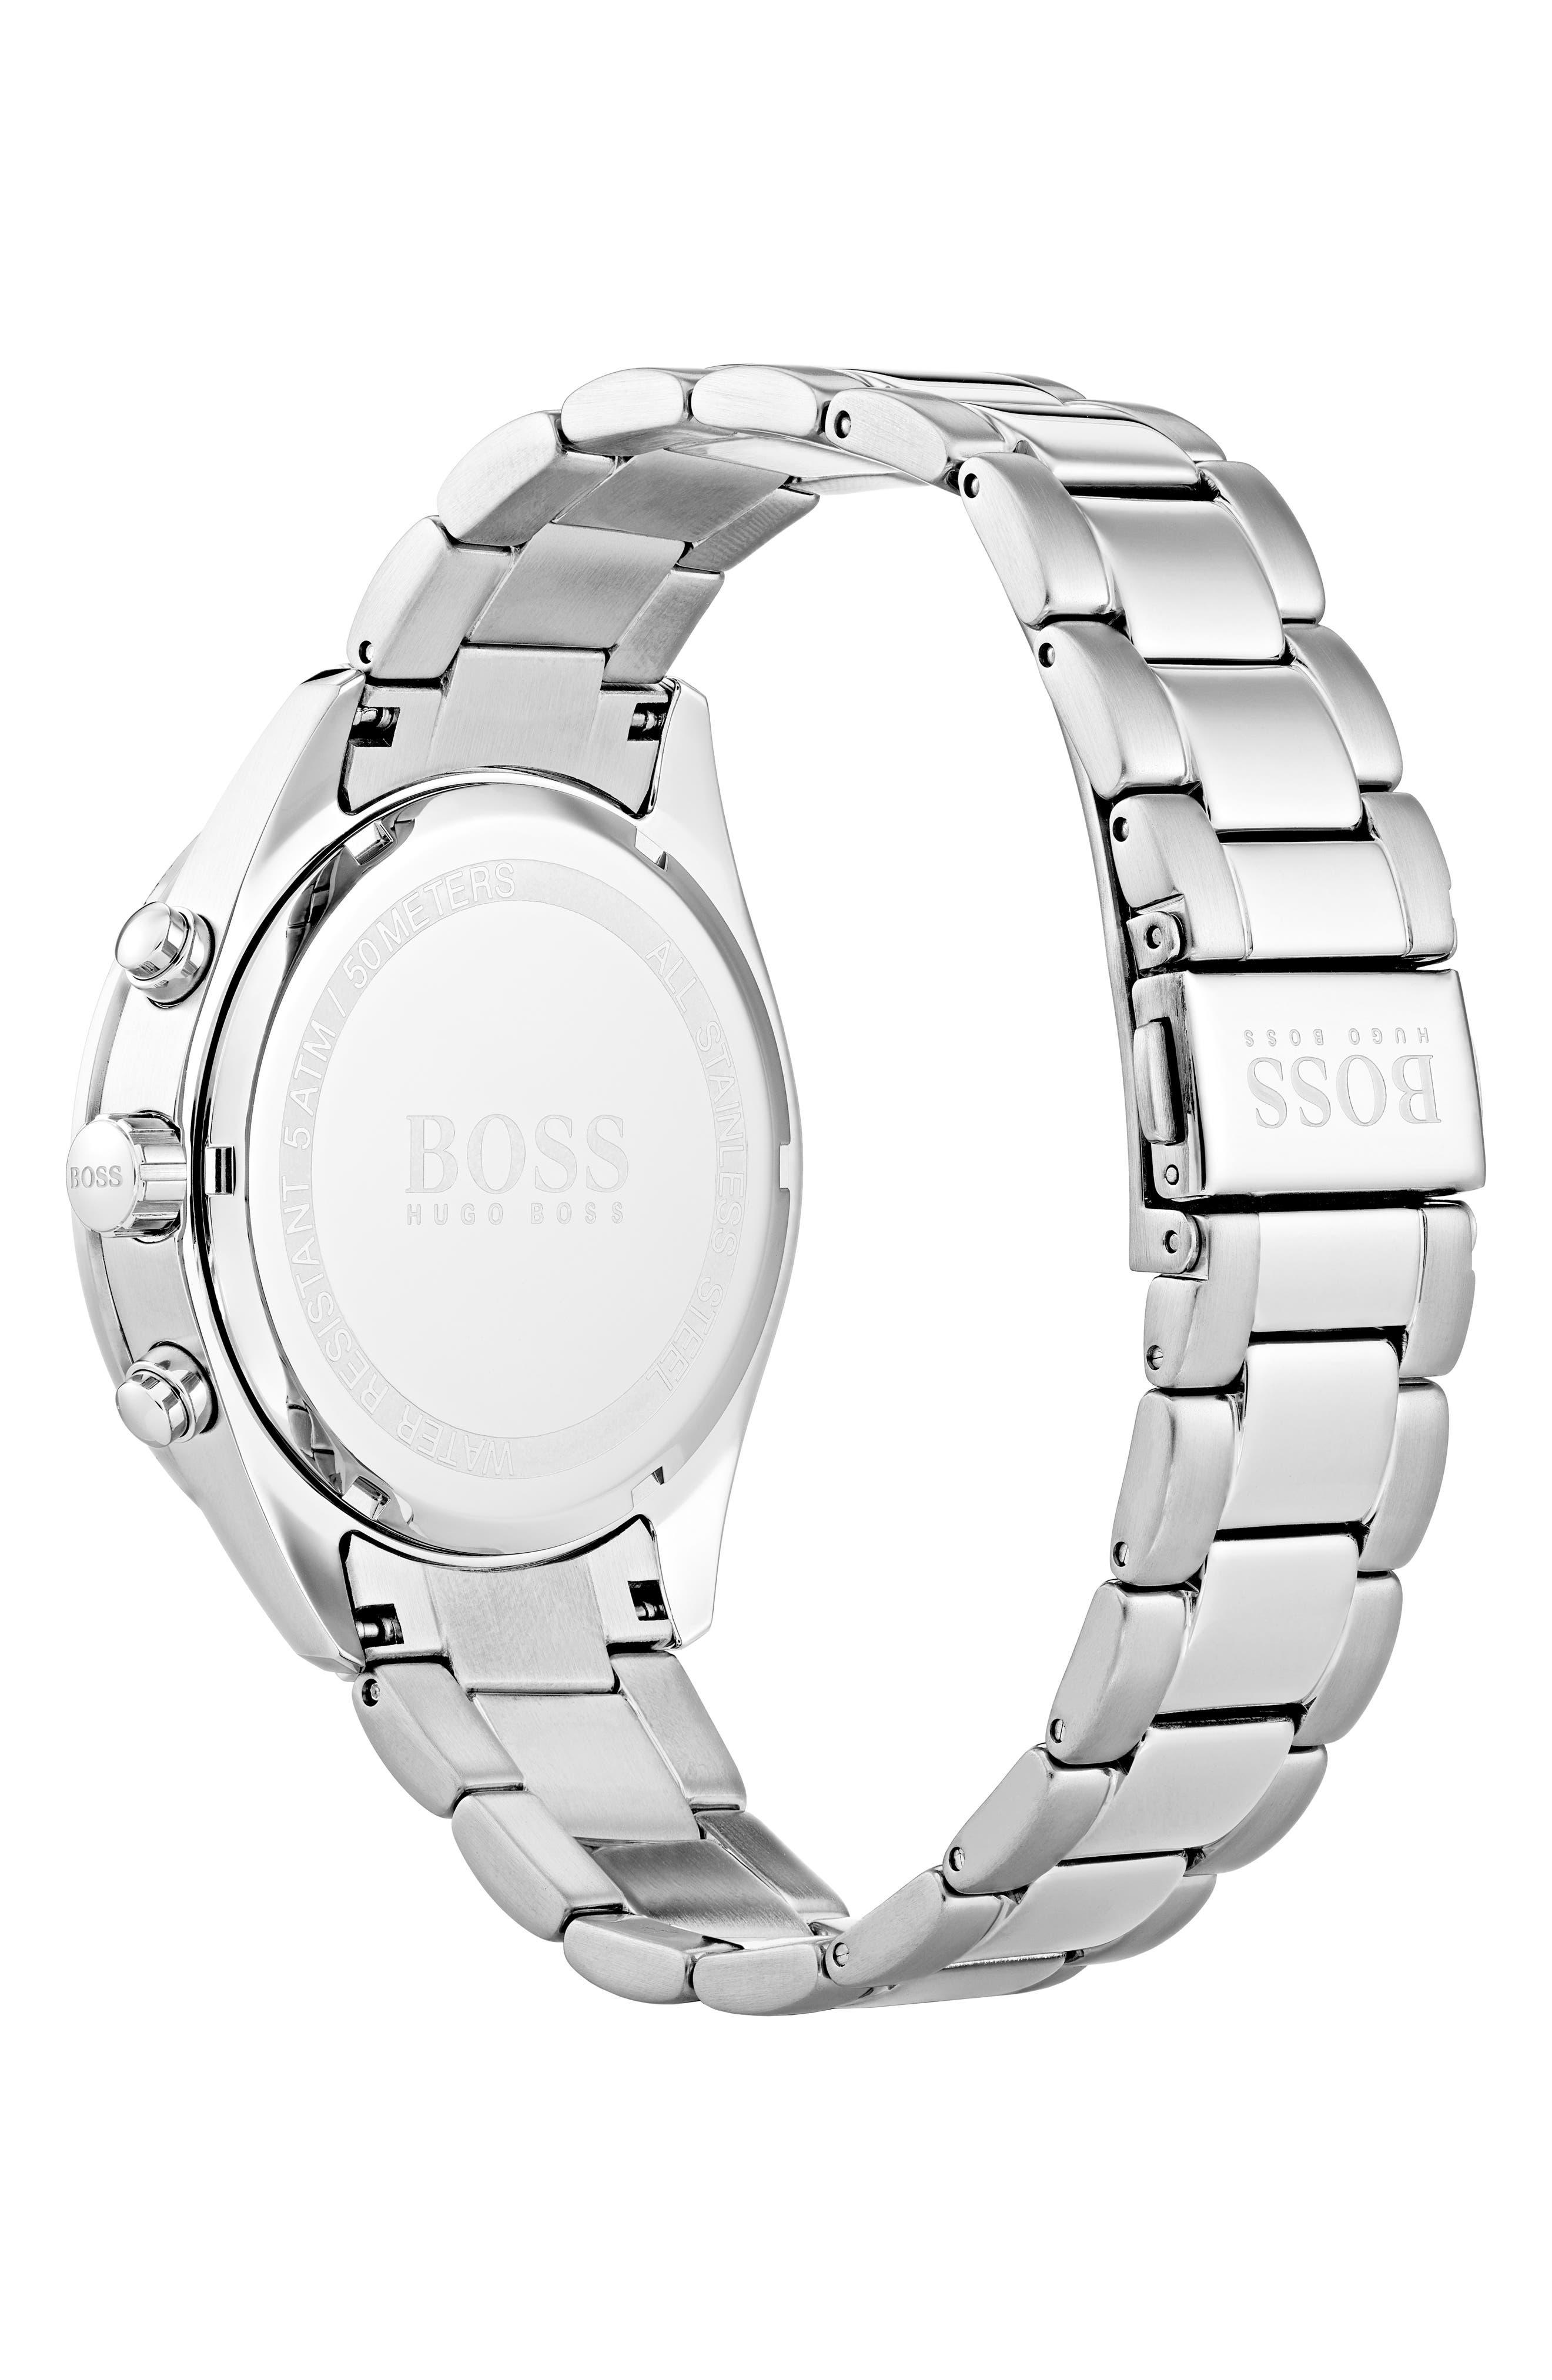 BOSS,                             Talent Chronograph Bracelet Watch, 42mm,                             Alternate thumbnail 2, color,                             BLUE/ STAINLESS